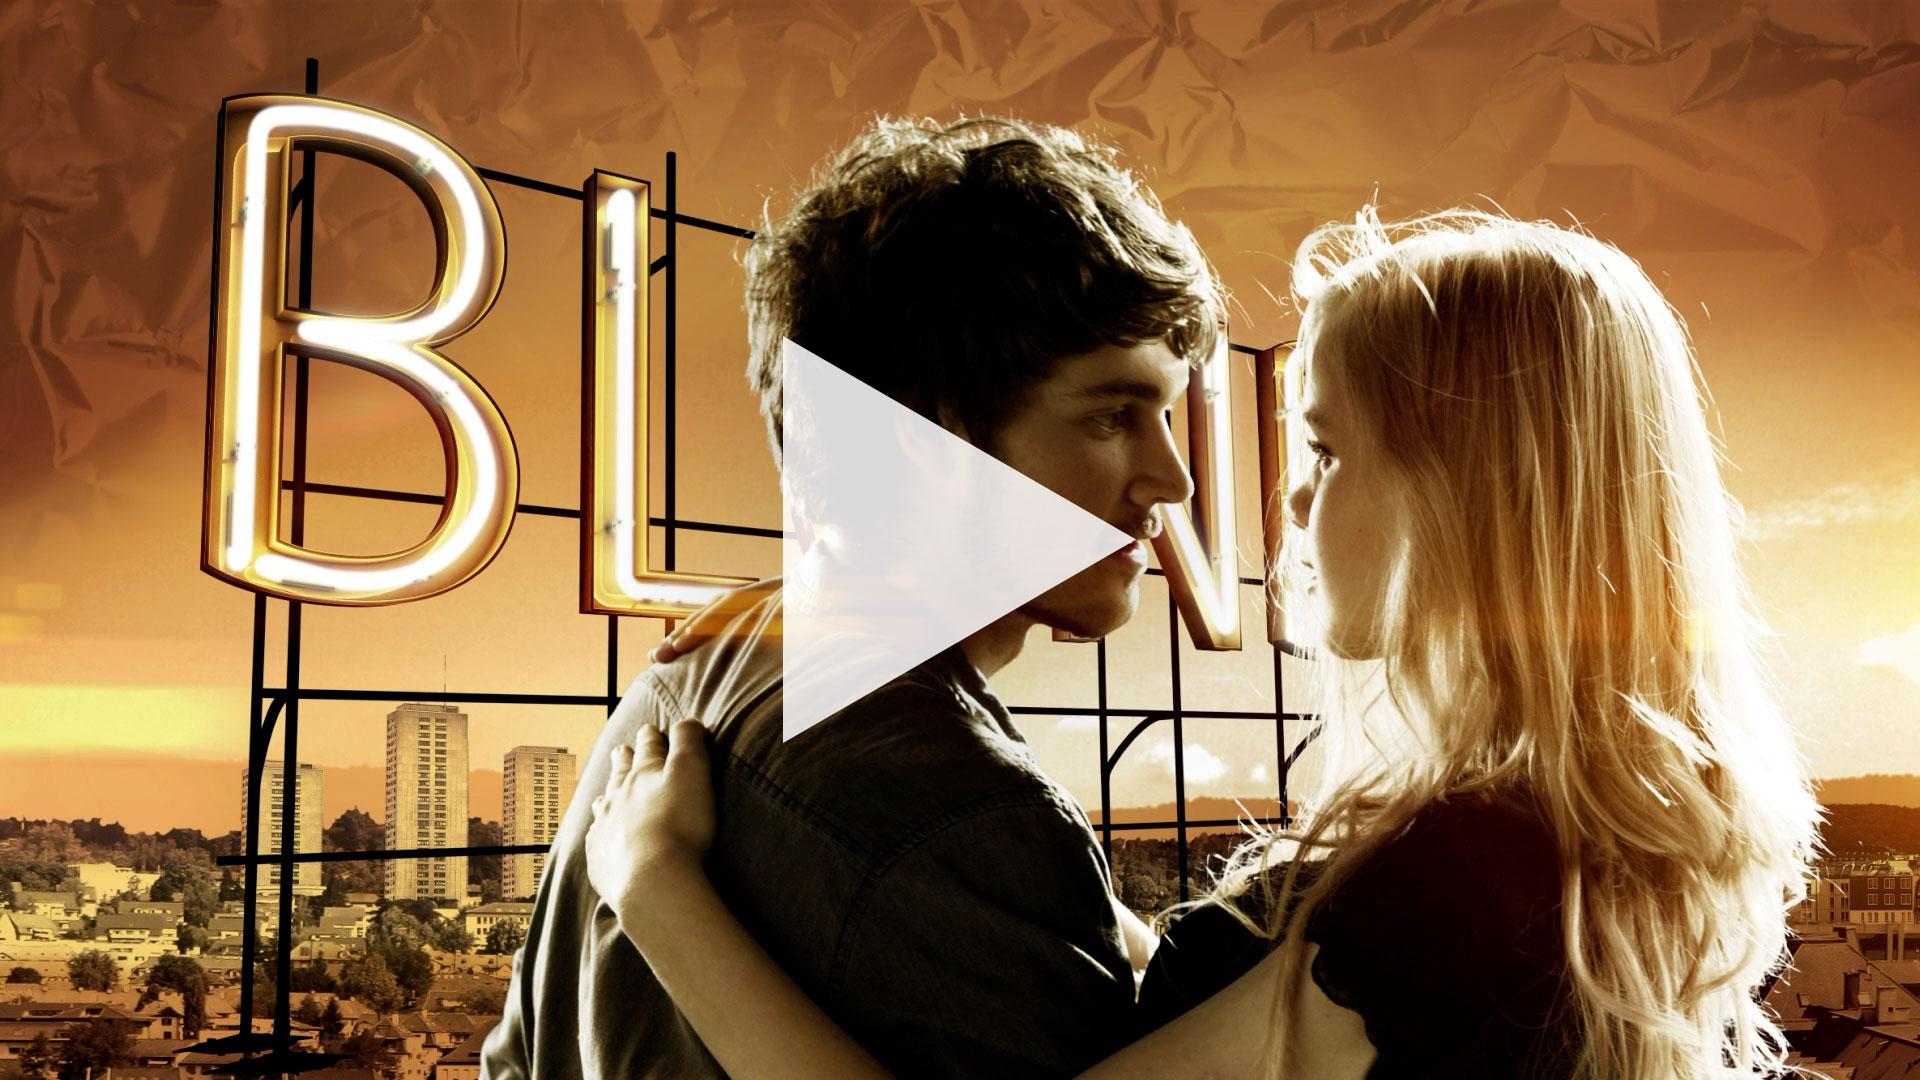 Pfeil-Thumbnail-Torino-Blond-02